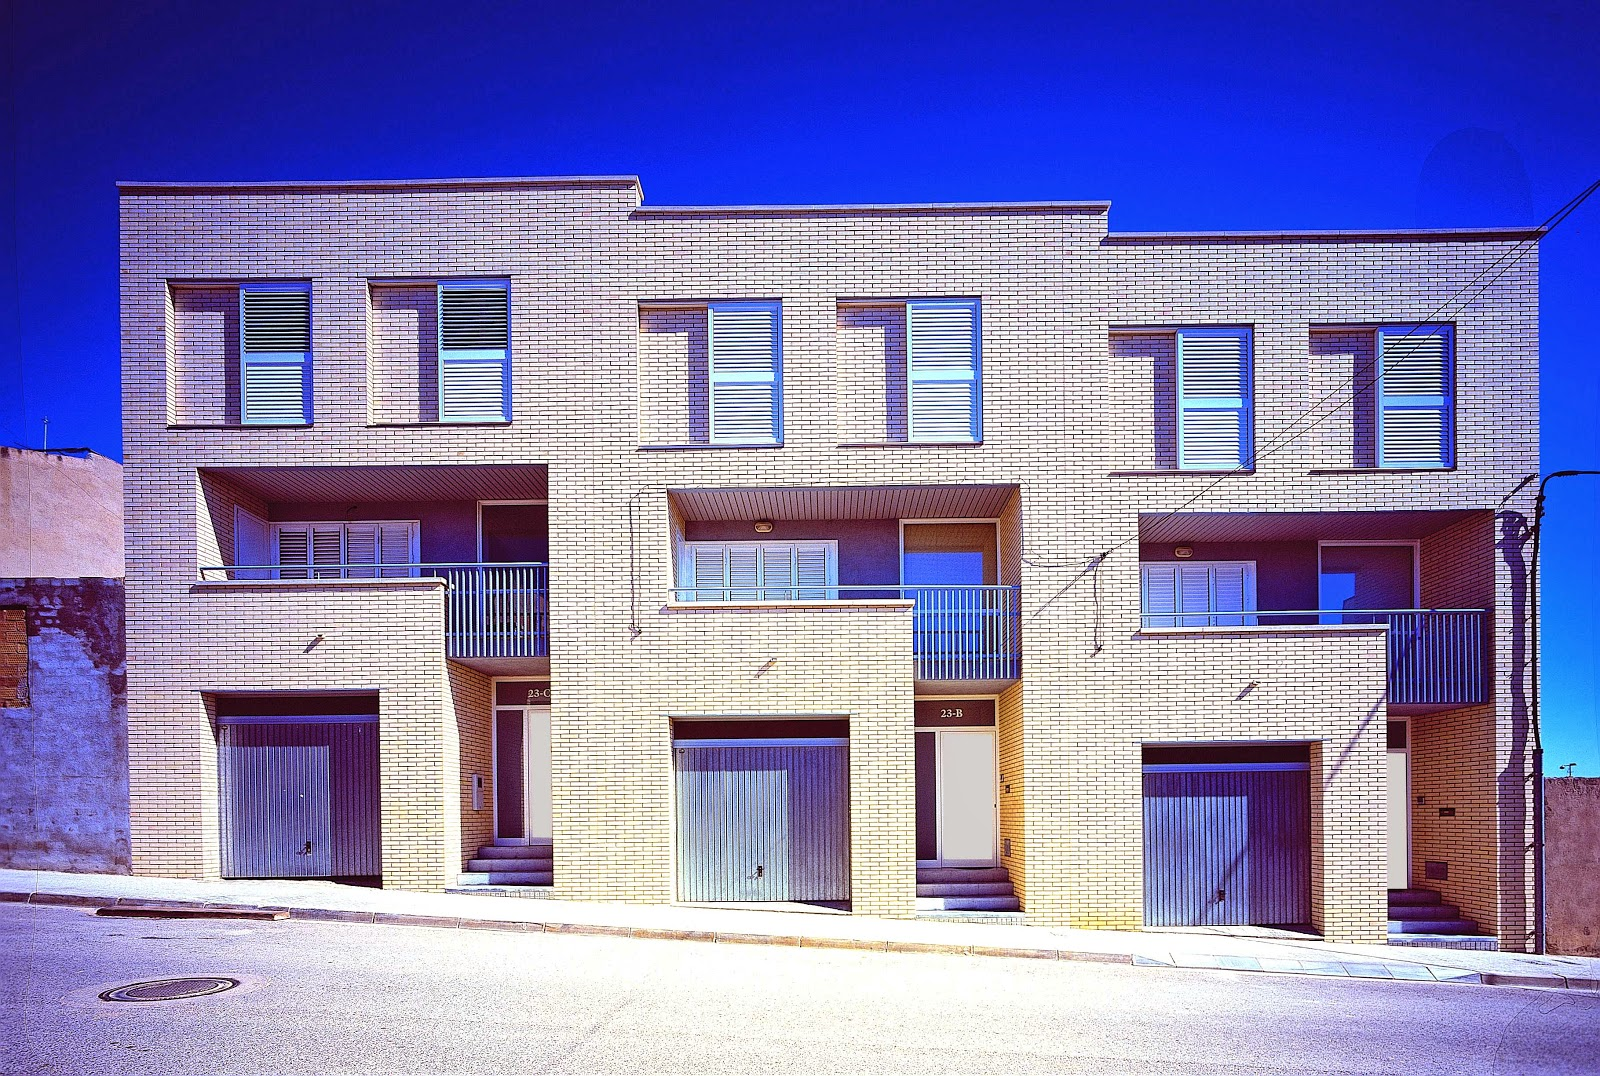 Aguilera guerrero agua arquitectos 3 viviendas - Arquitectos tarragona ...